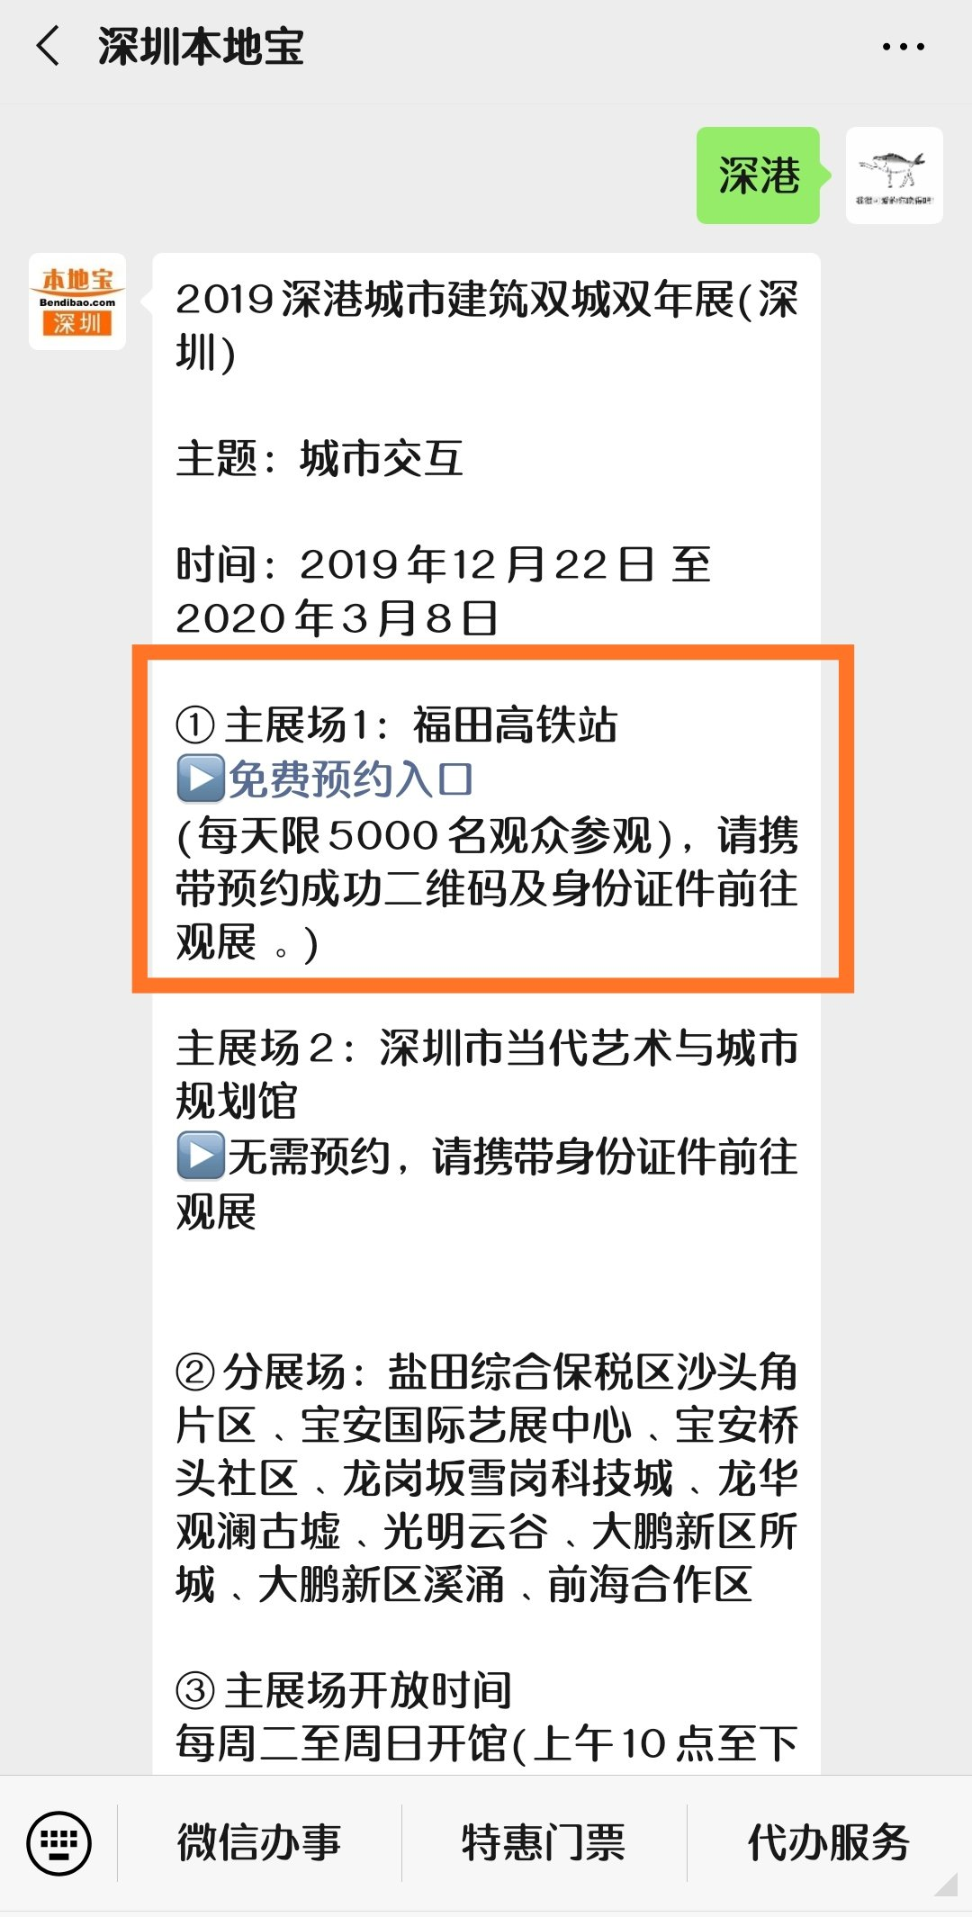 http://www.ysj98.com/caijing/1772057.html